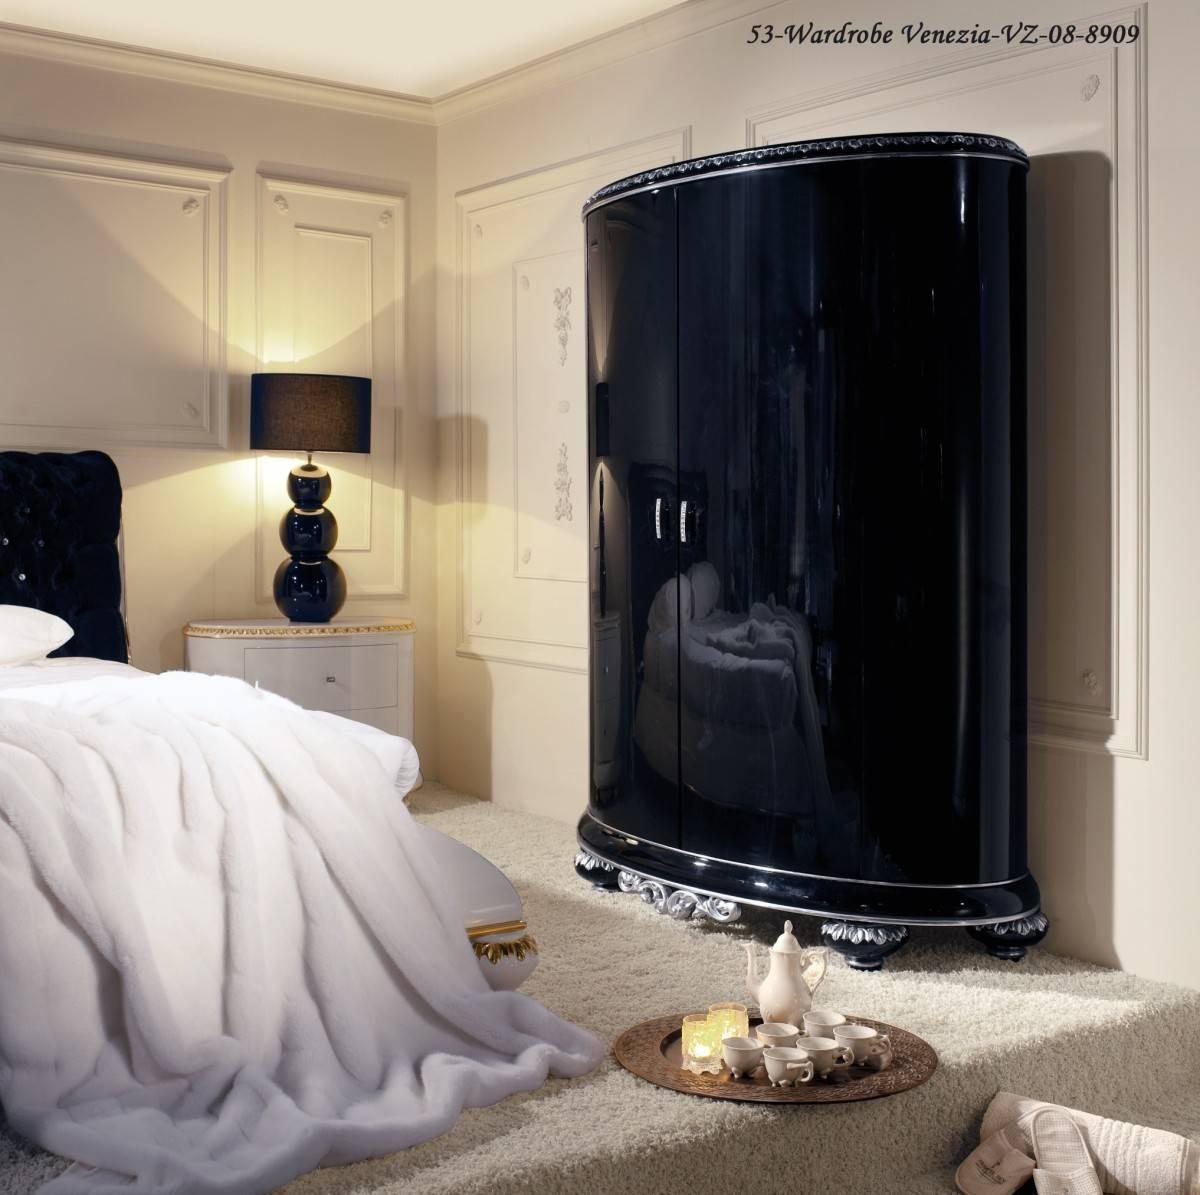 Piano Gloss Black Wardrobe & Diamante Handles, Luxury Furniture regarding High Gloss Black Wardrobes (Image 8 of 15)